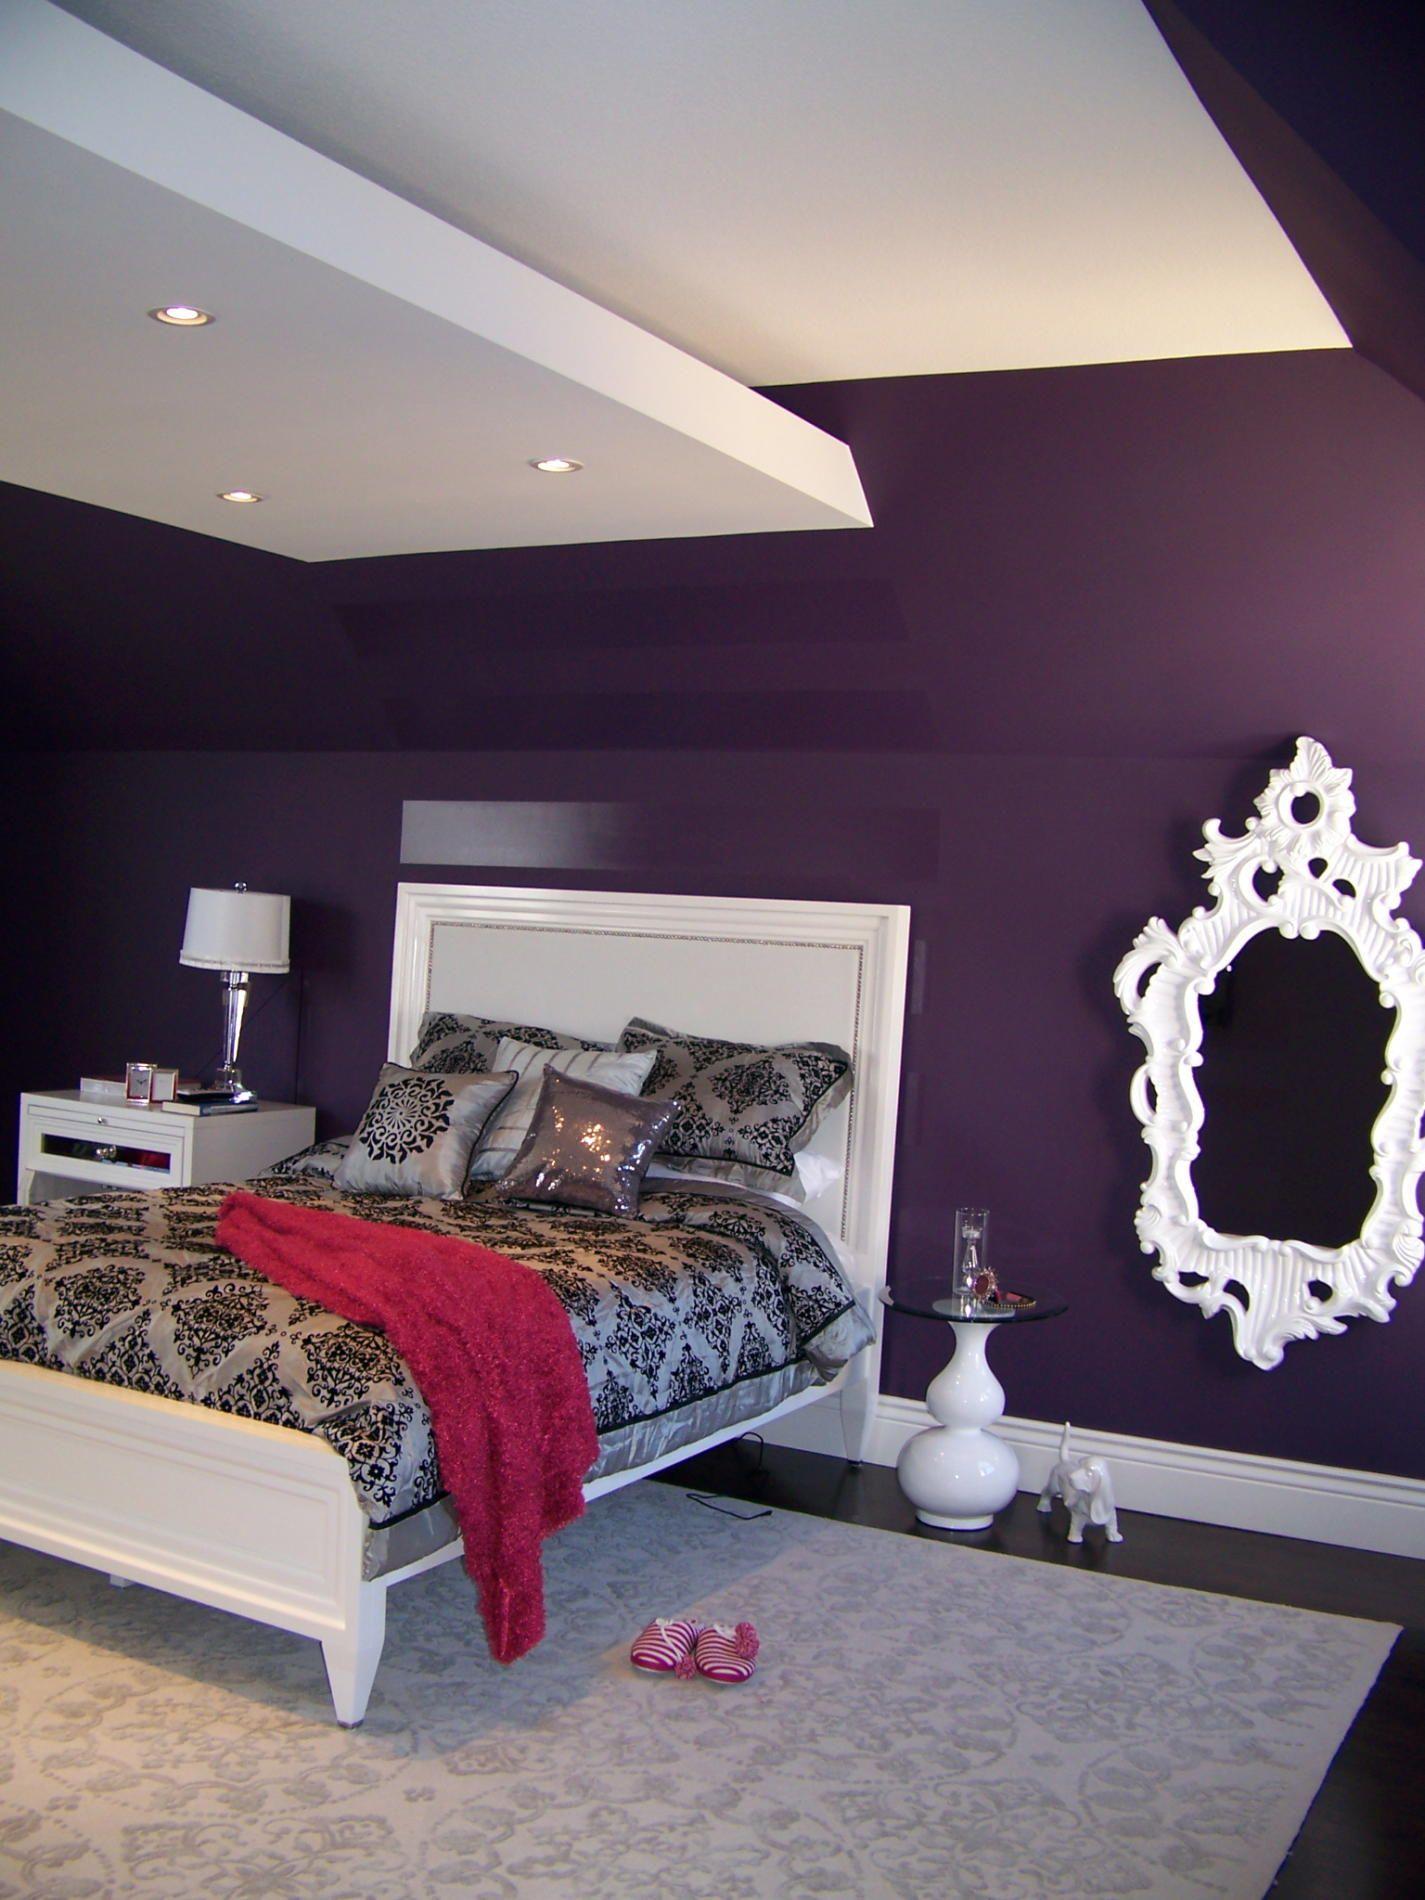 Badezimmer ideen für teenager purple paint for teen bedroom  teenage bedroom ideas x nina